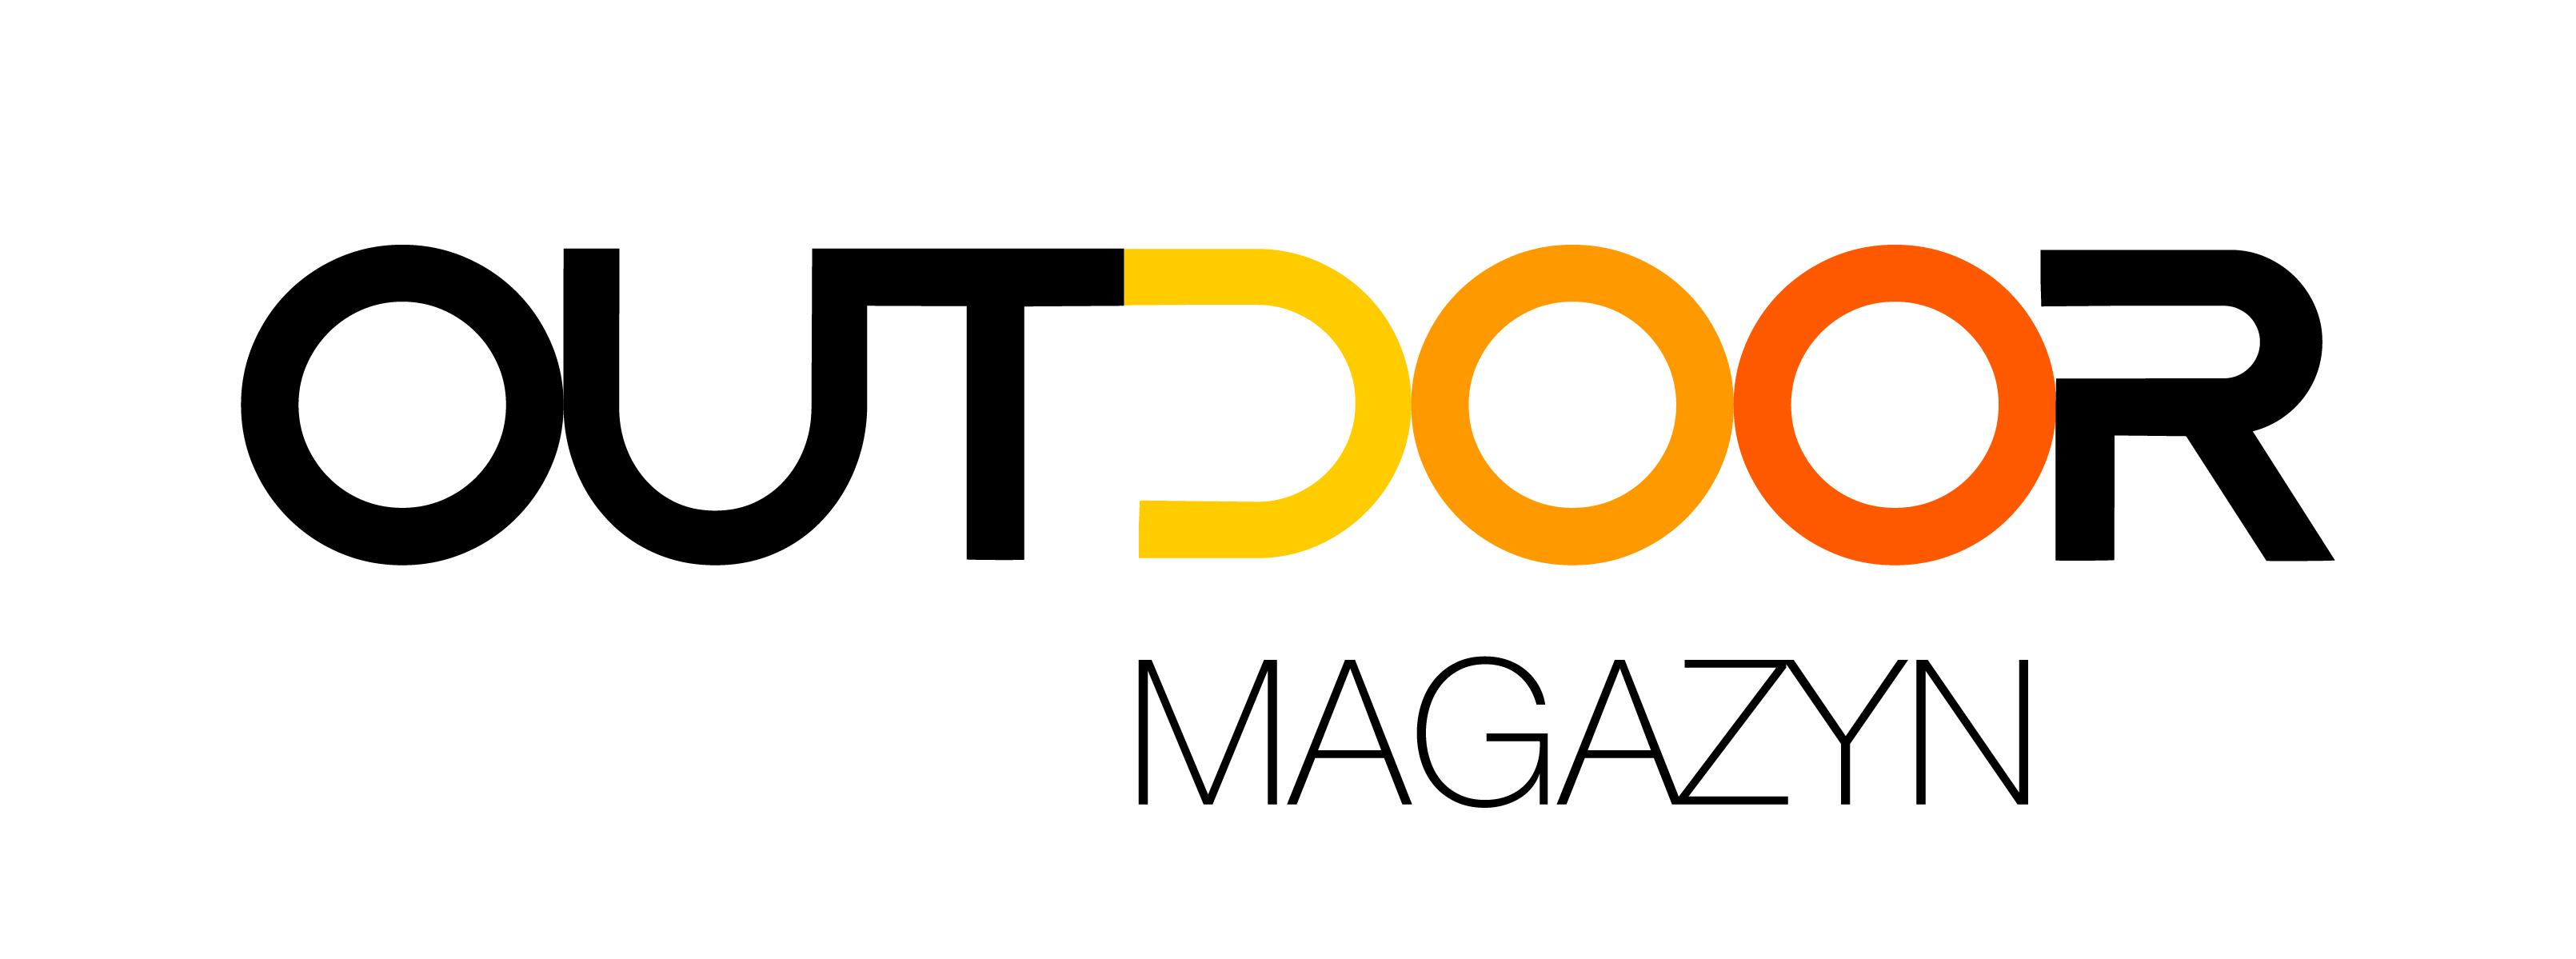 Outdoor Magazyn - Reklama NSK 2020